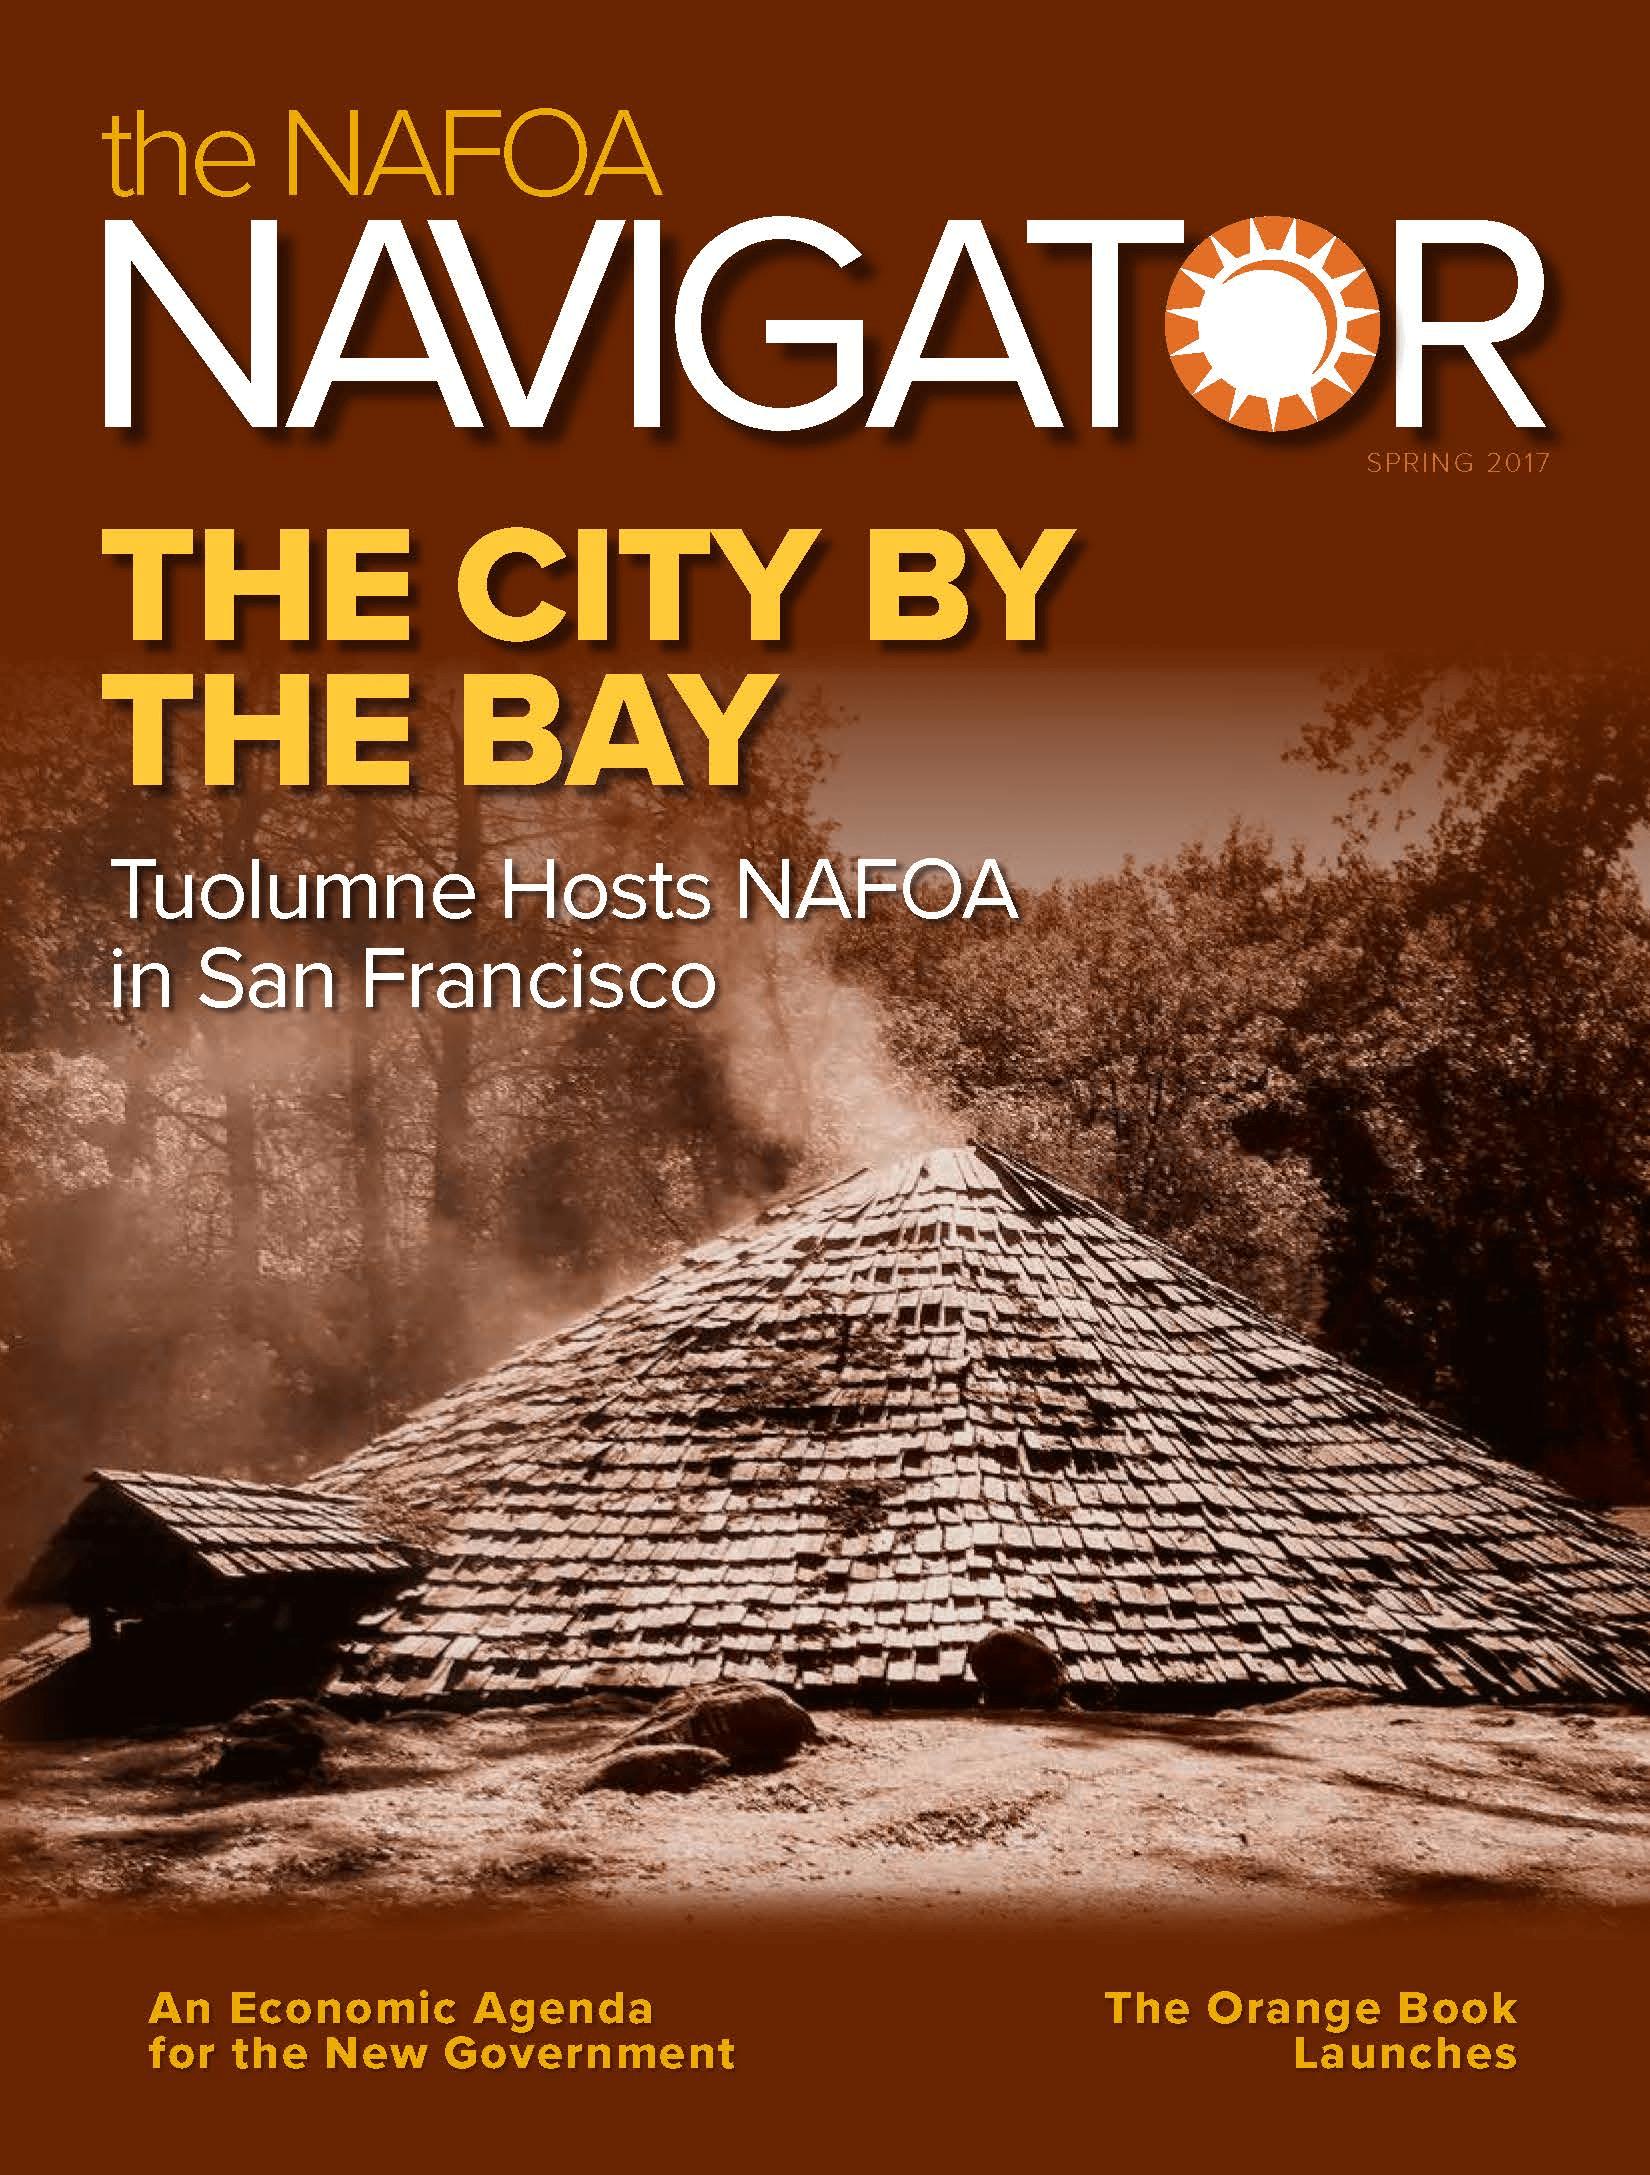 Spring 2017 NAFOA Navigator